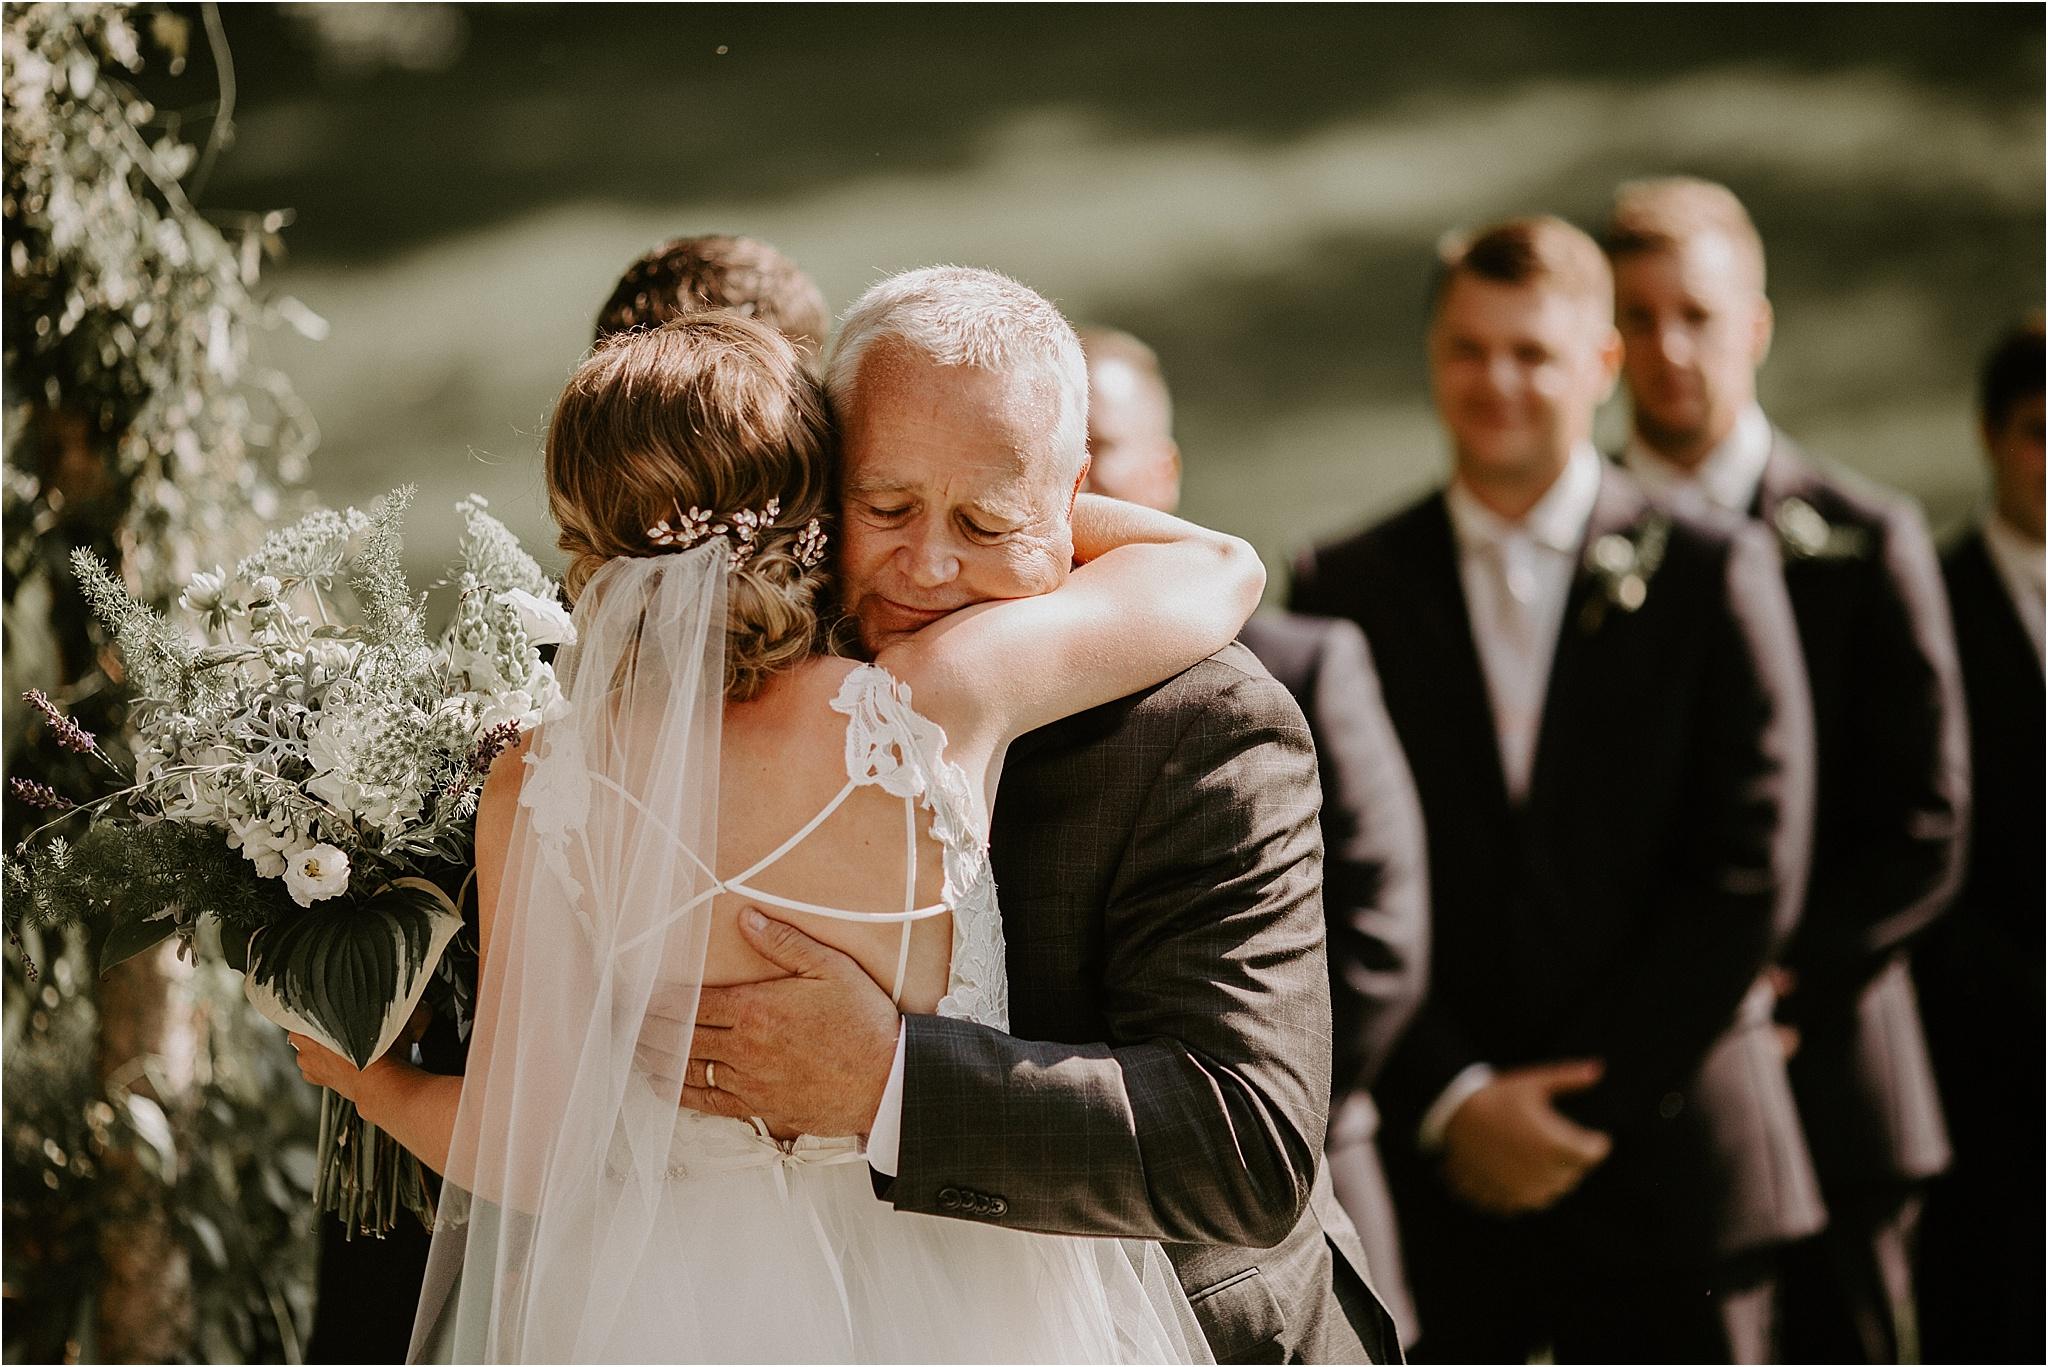 Sarah_Brookhart_Lancaster_Wedding_Photographer_0033.jpg